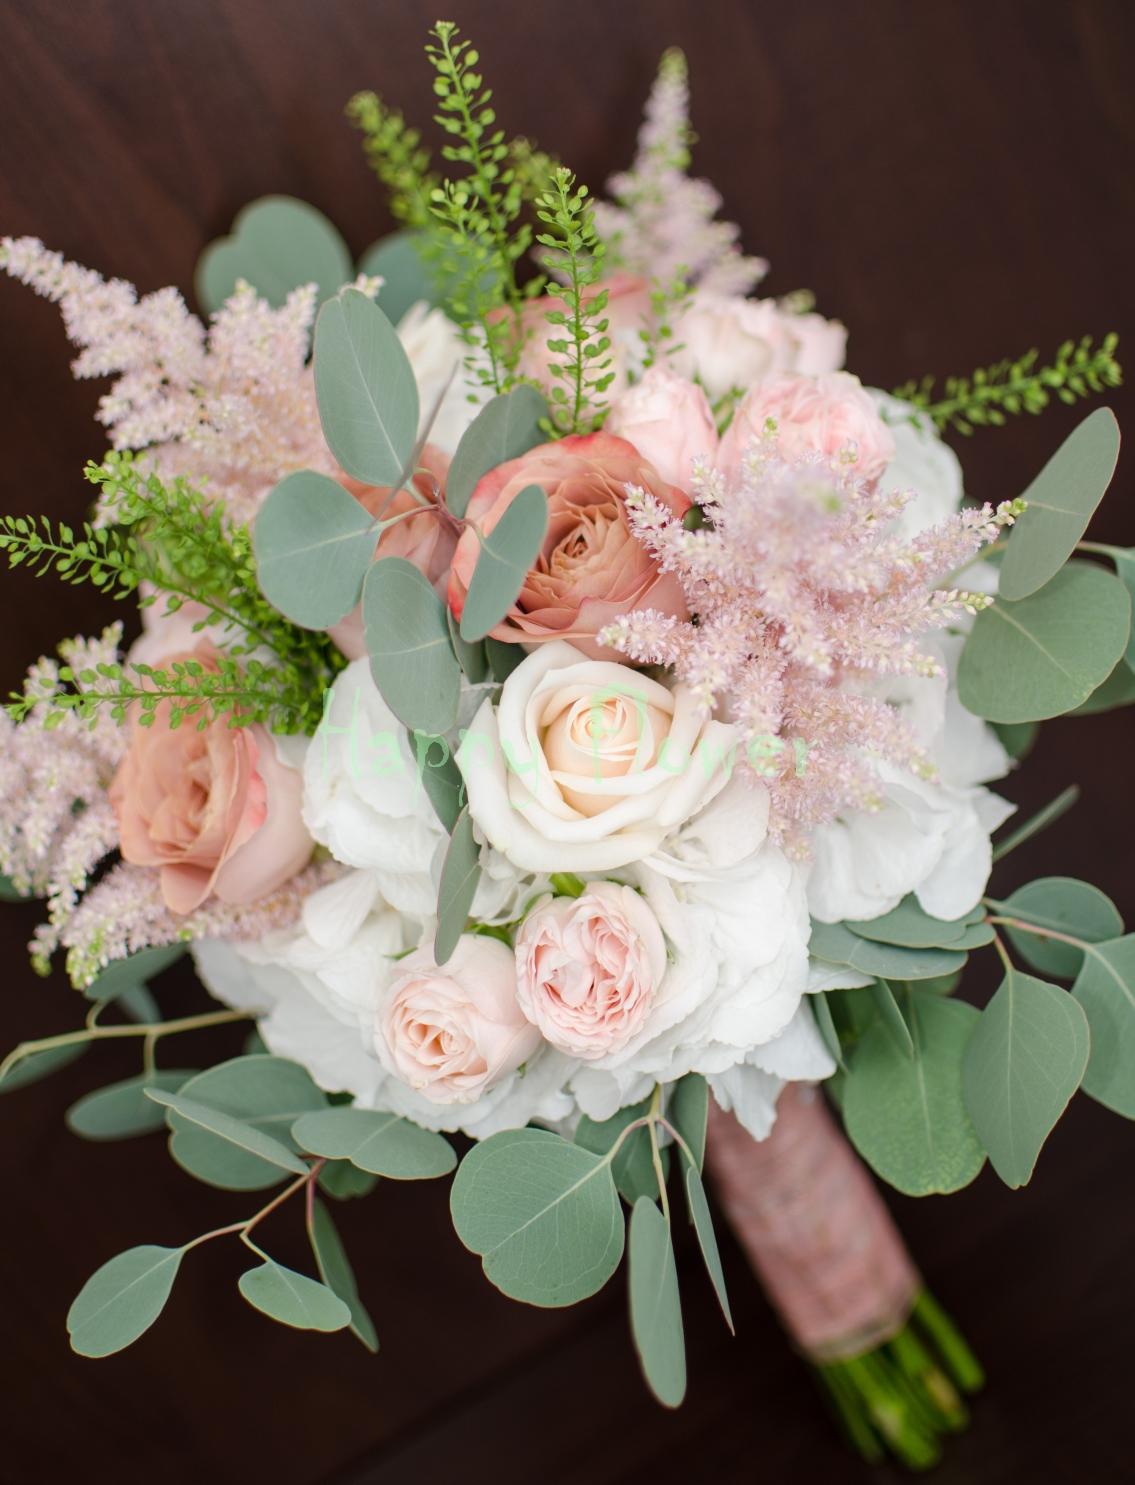 Buchet mireasa hortensii albe, trandafiri pastel, astilbe roz, eucalipt